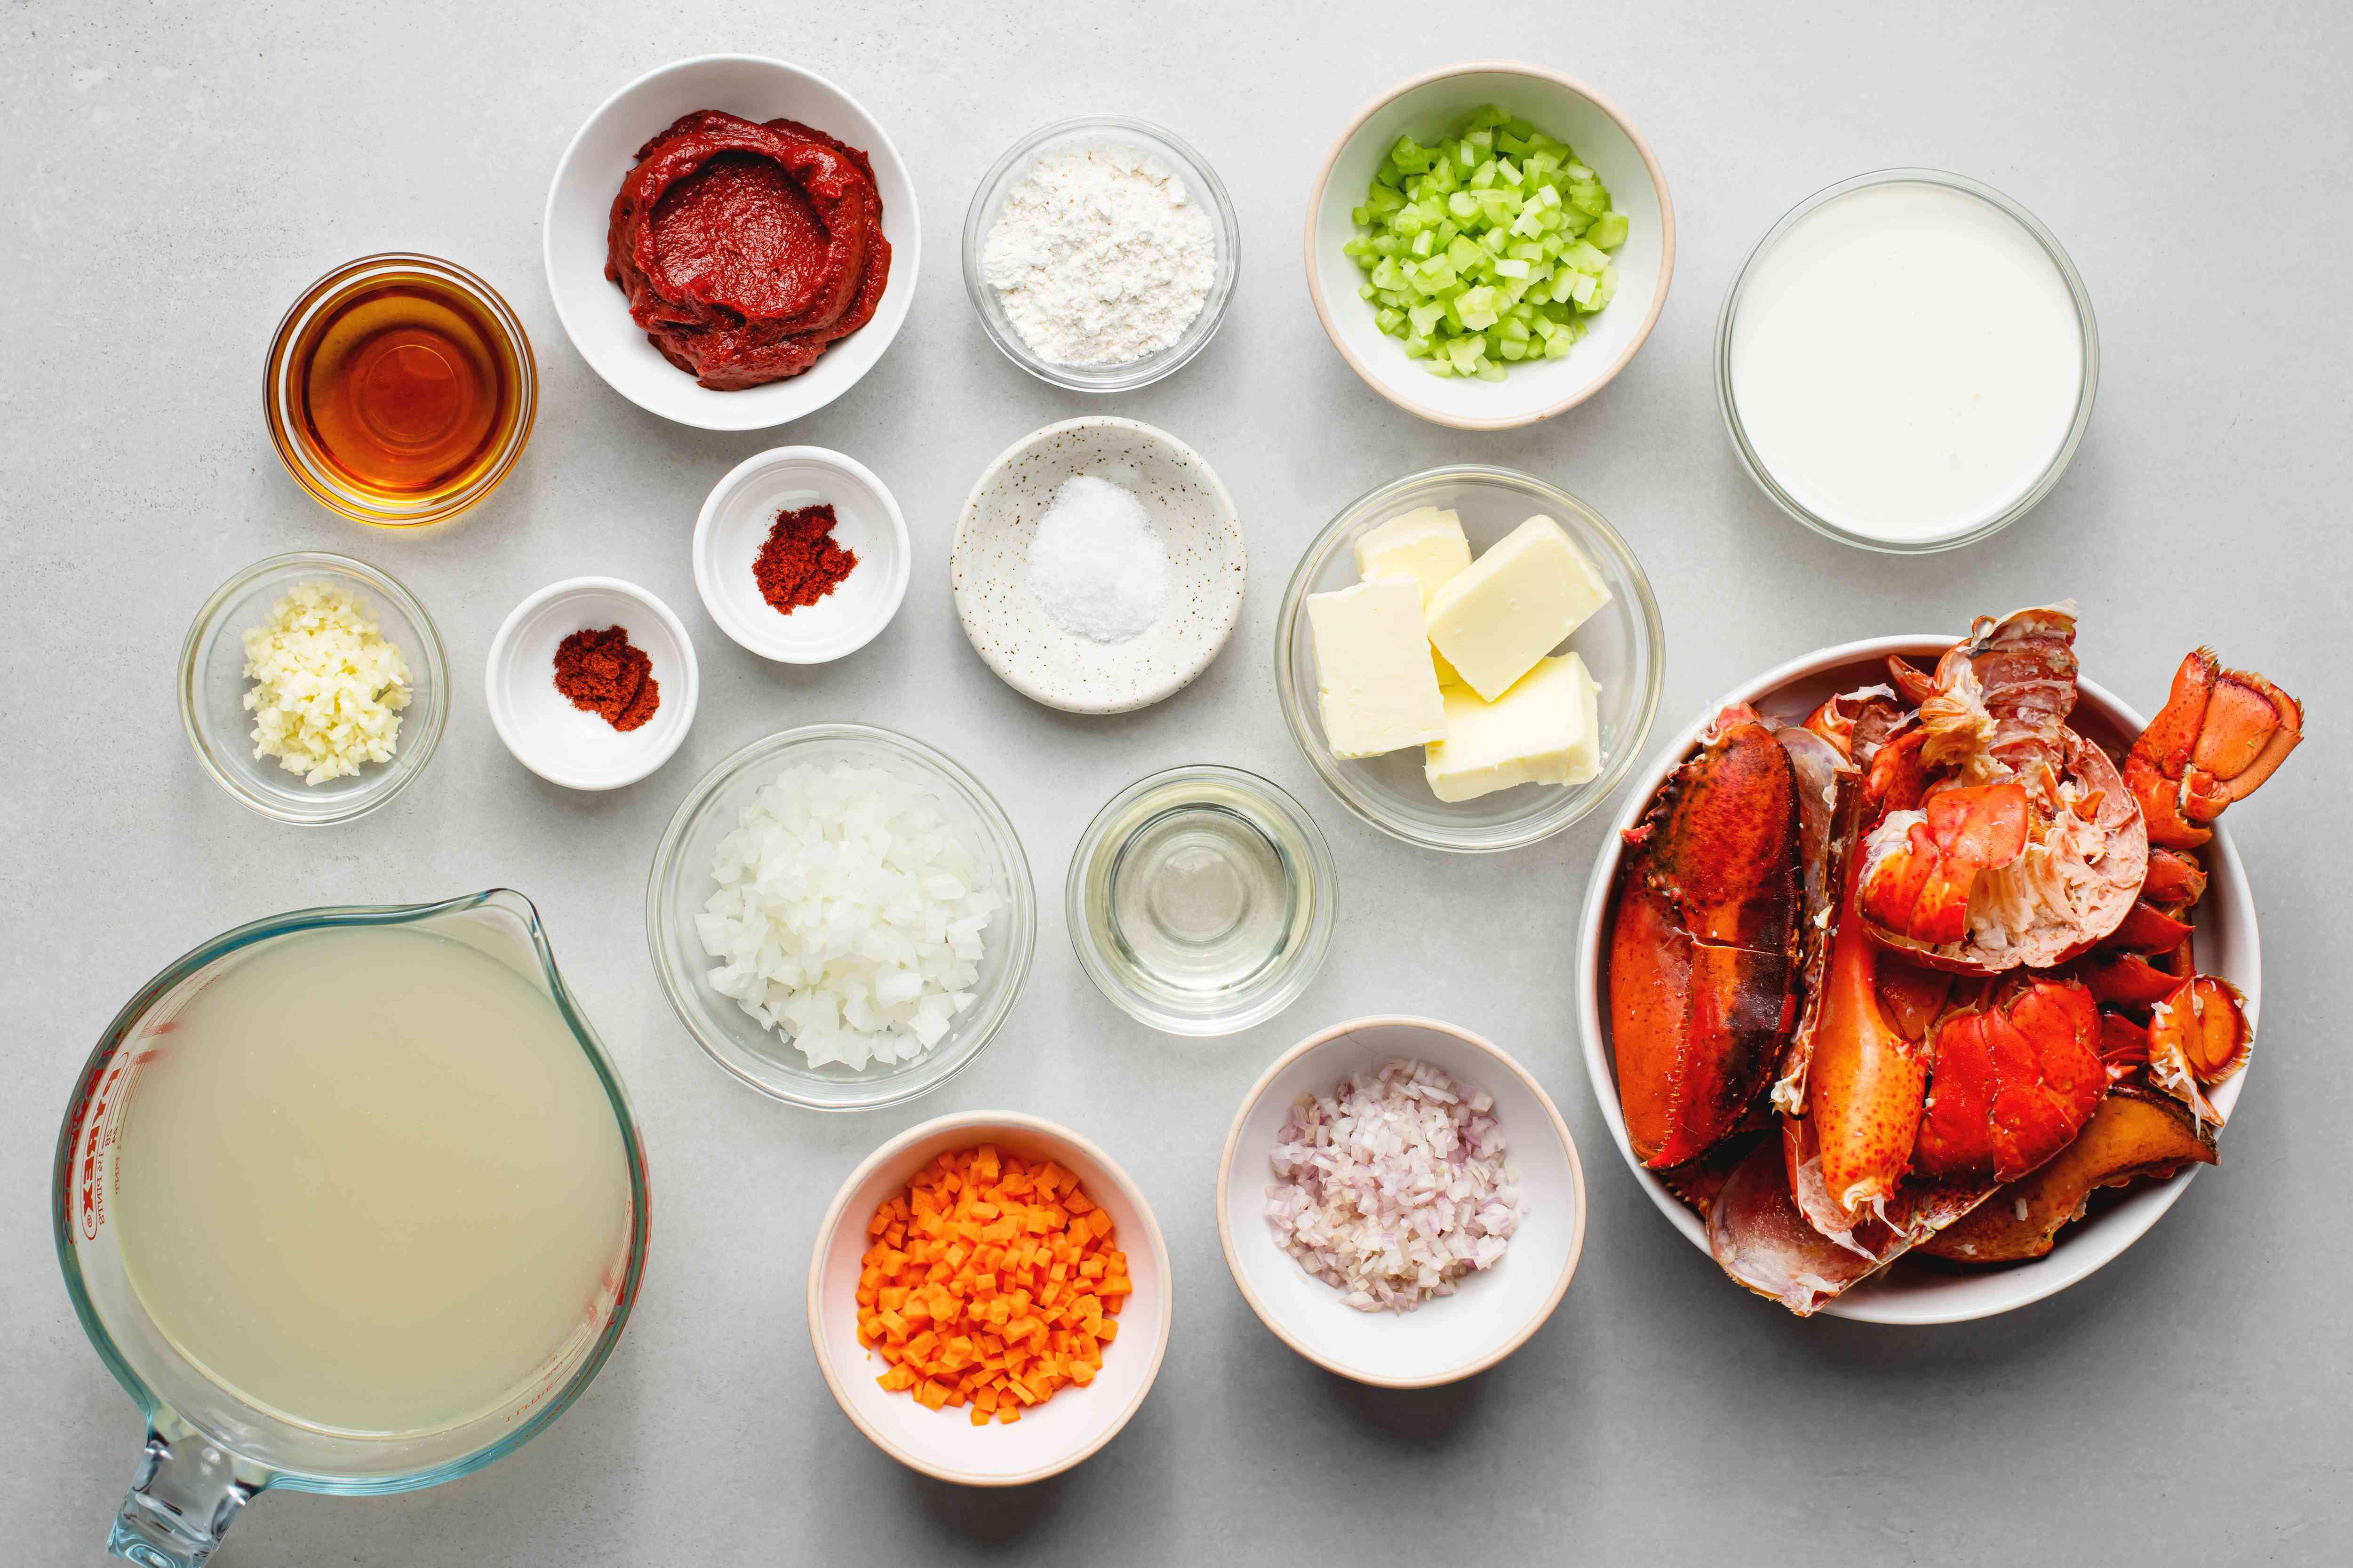 Emeril's Homemade Lobster Sauce ingredients